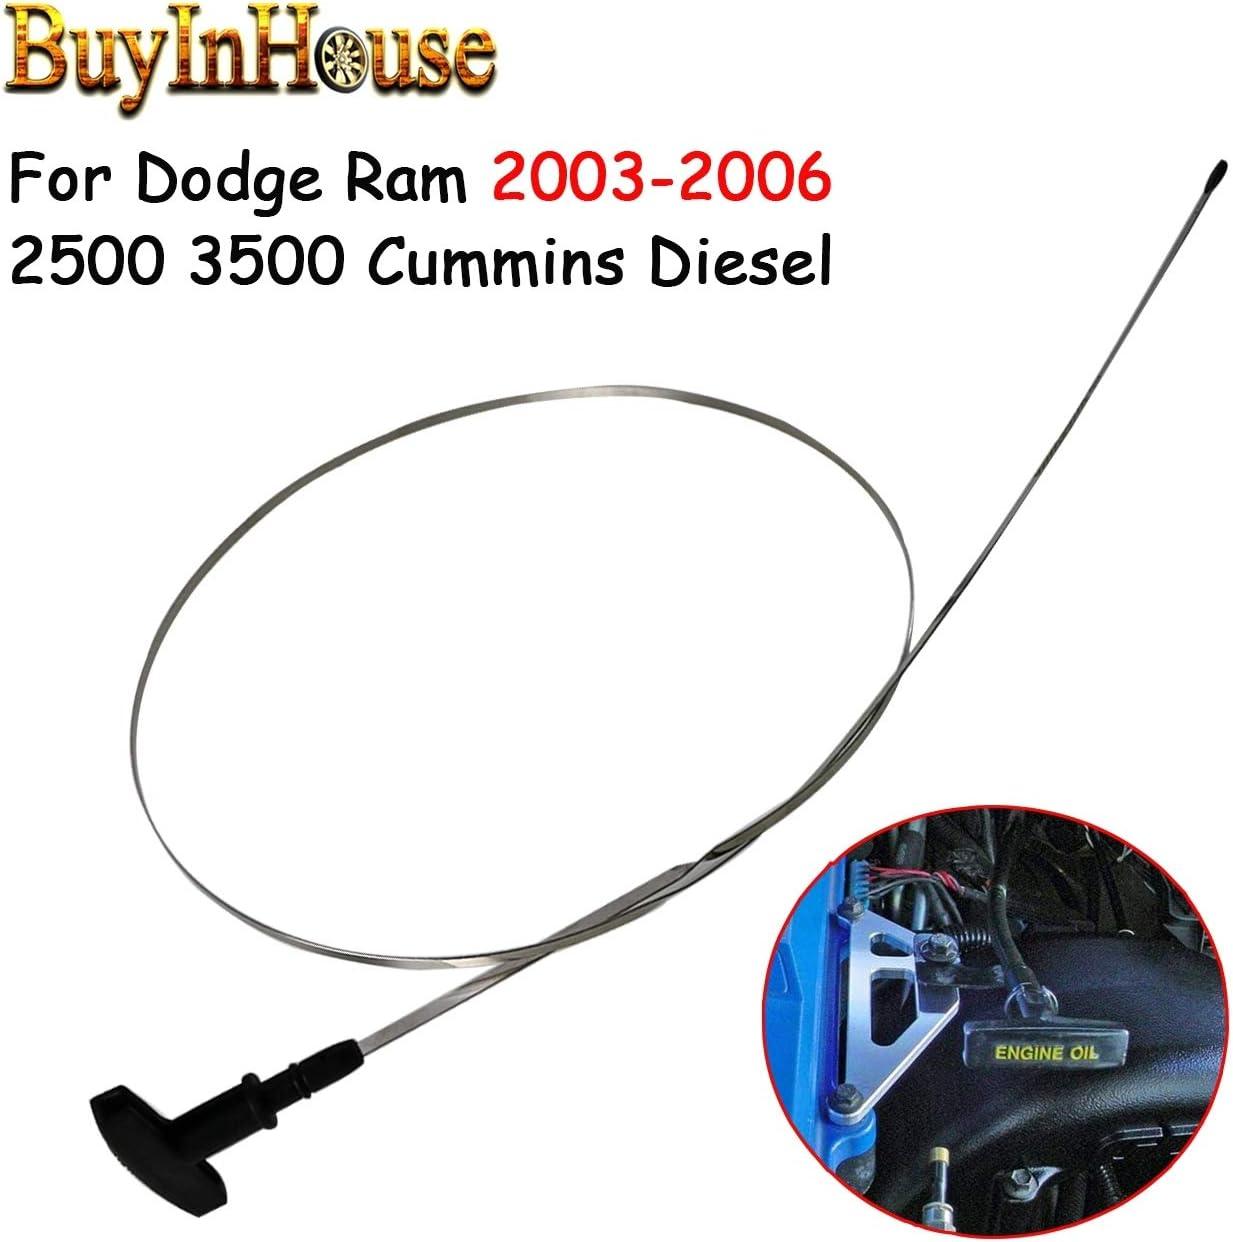 buyinhouse for 2003-2006 Dodge Ram 2500 3500 Cummins Diesel Engine Oil Dipstick Indicator 5.9L